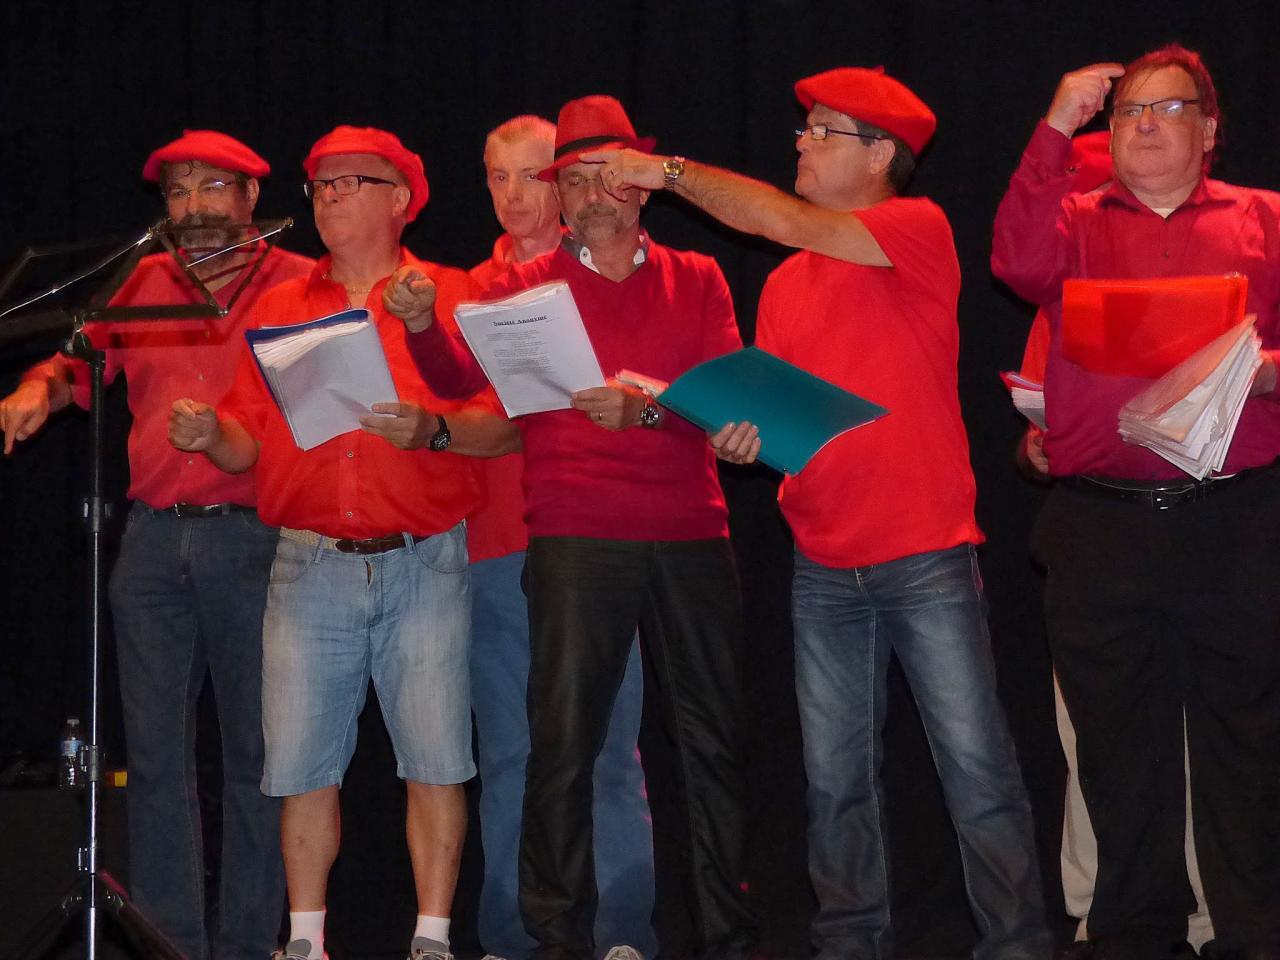 Festin Choral Apéro chantant-040